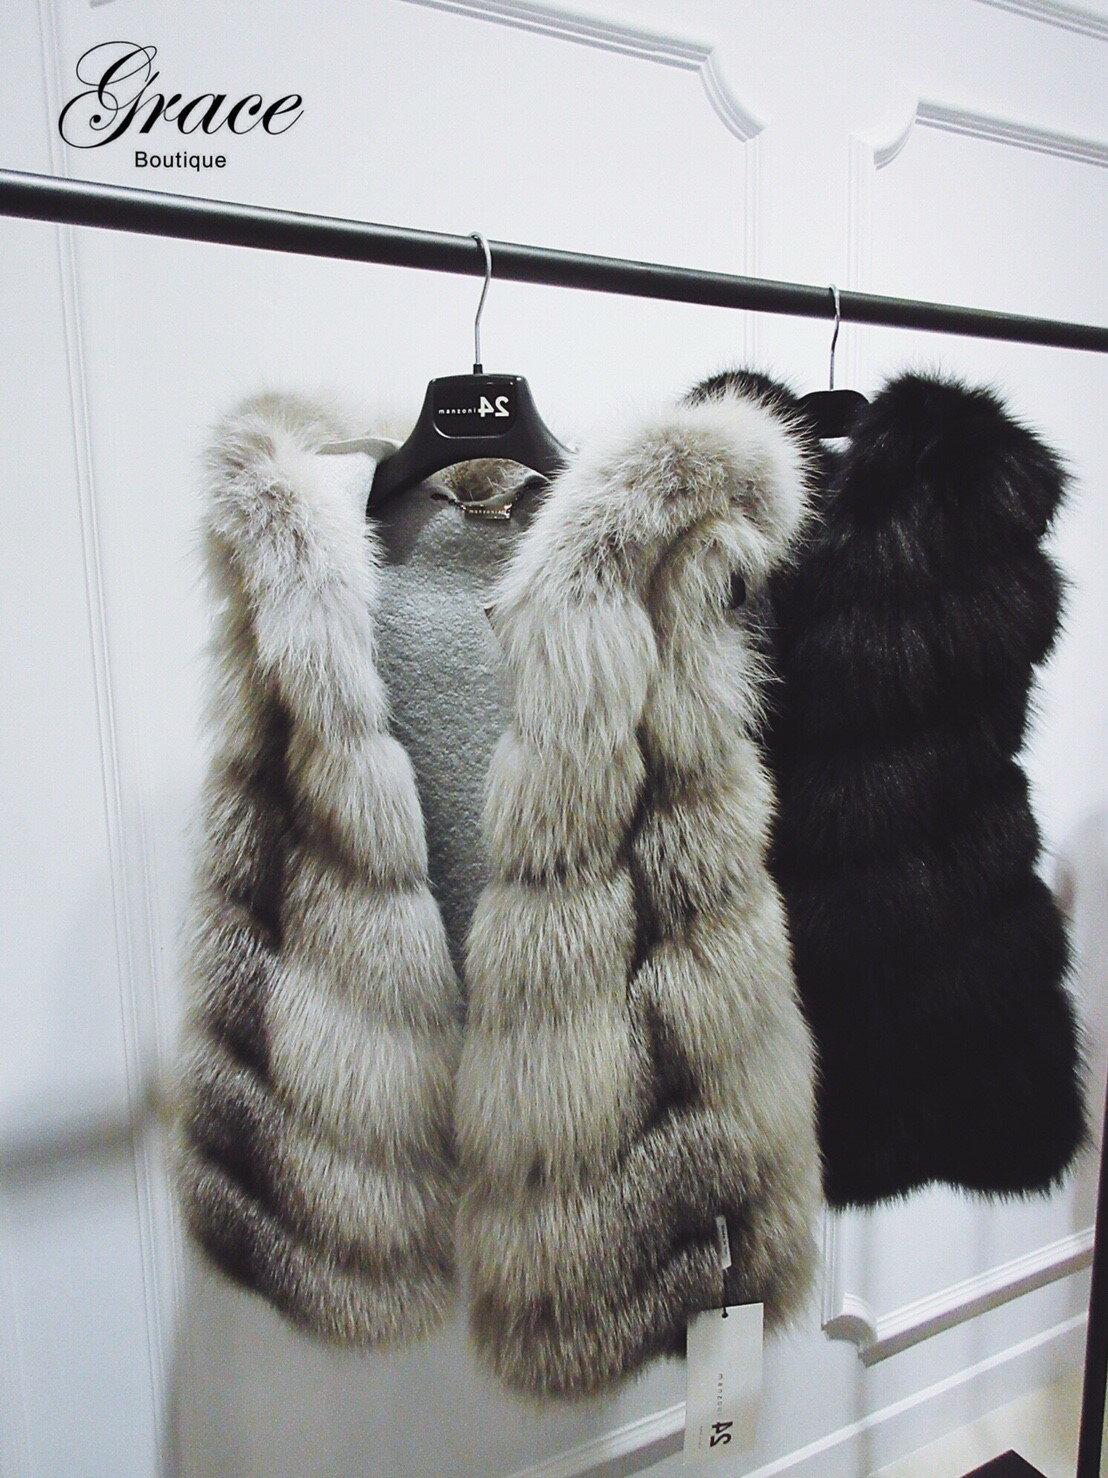 Grace Boutique MANZONI24 狐狸毛皮草背心 灰  キツネの毛皮のベスト